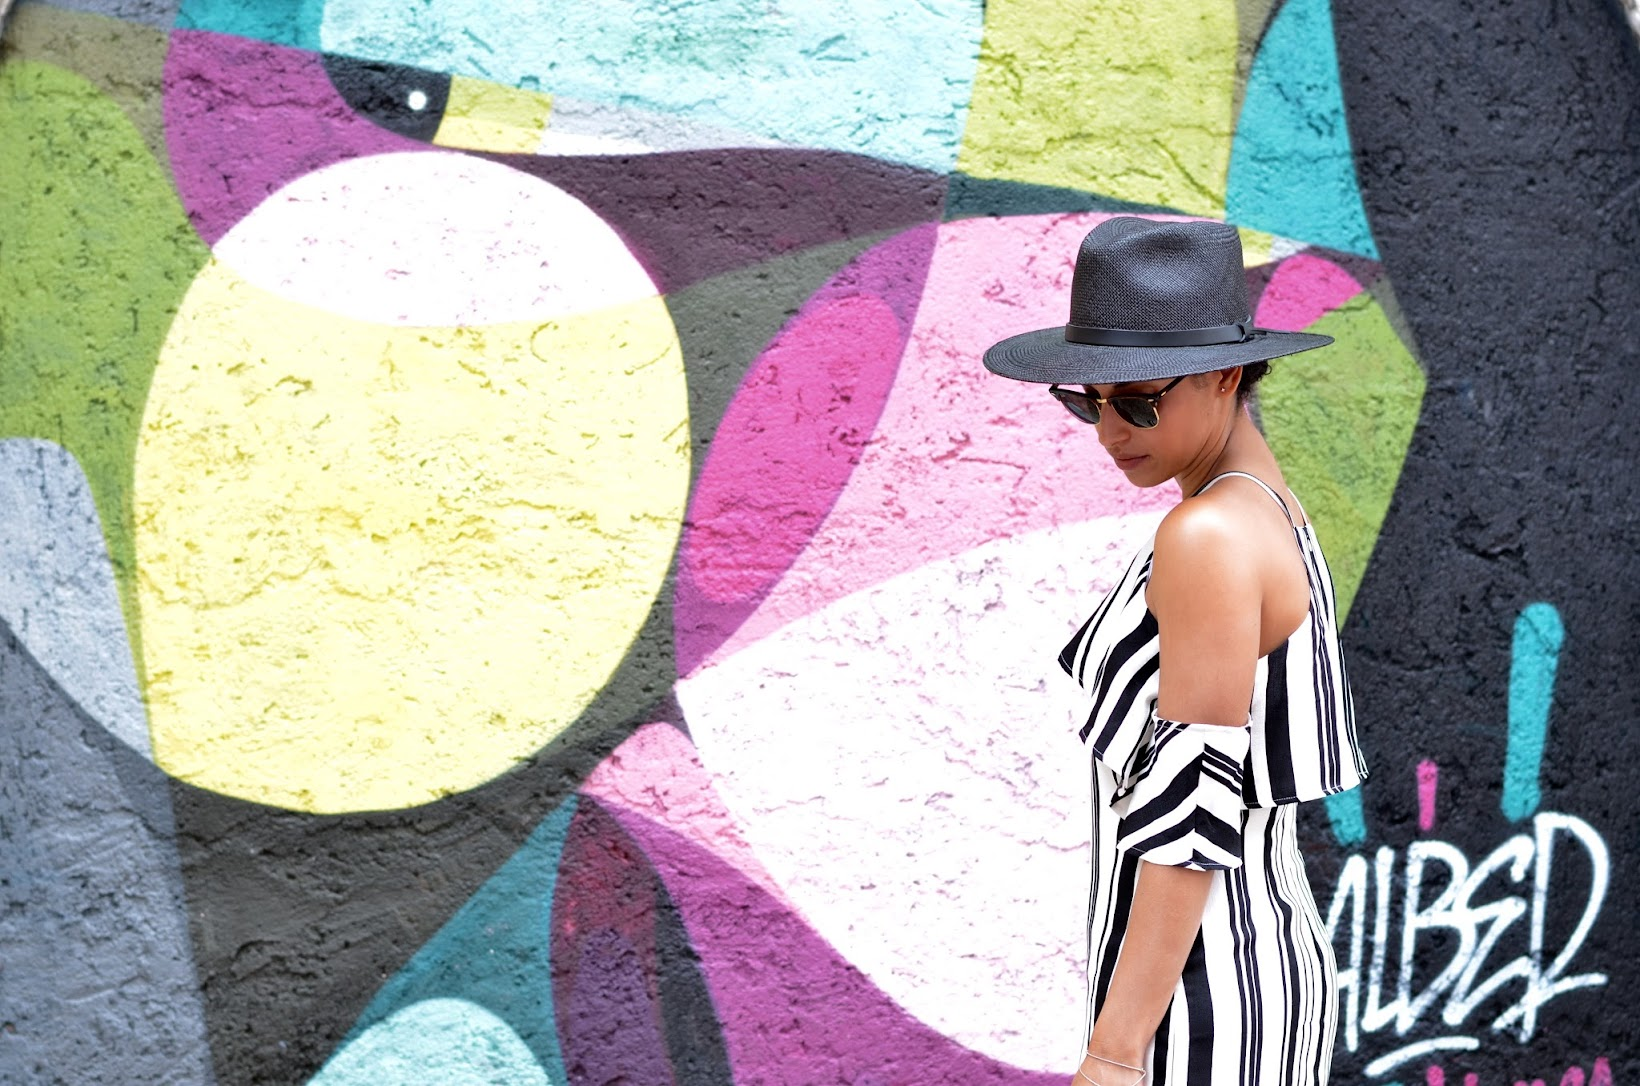 lisbon, portugal, street style in lisbon, what to wear in lisbon, what to wear in portugal, summer style, European vacation, black straw fedora, Goorin Bros straw fedora, striped Joa dress, J.O.A, chic summer vacation style